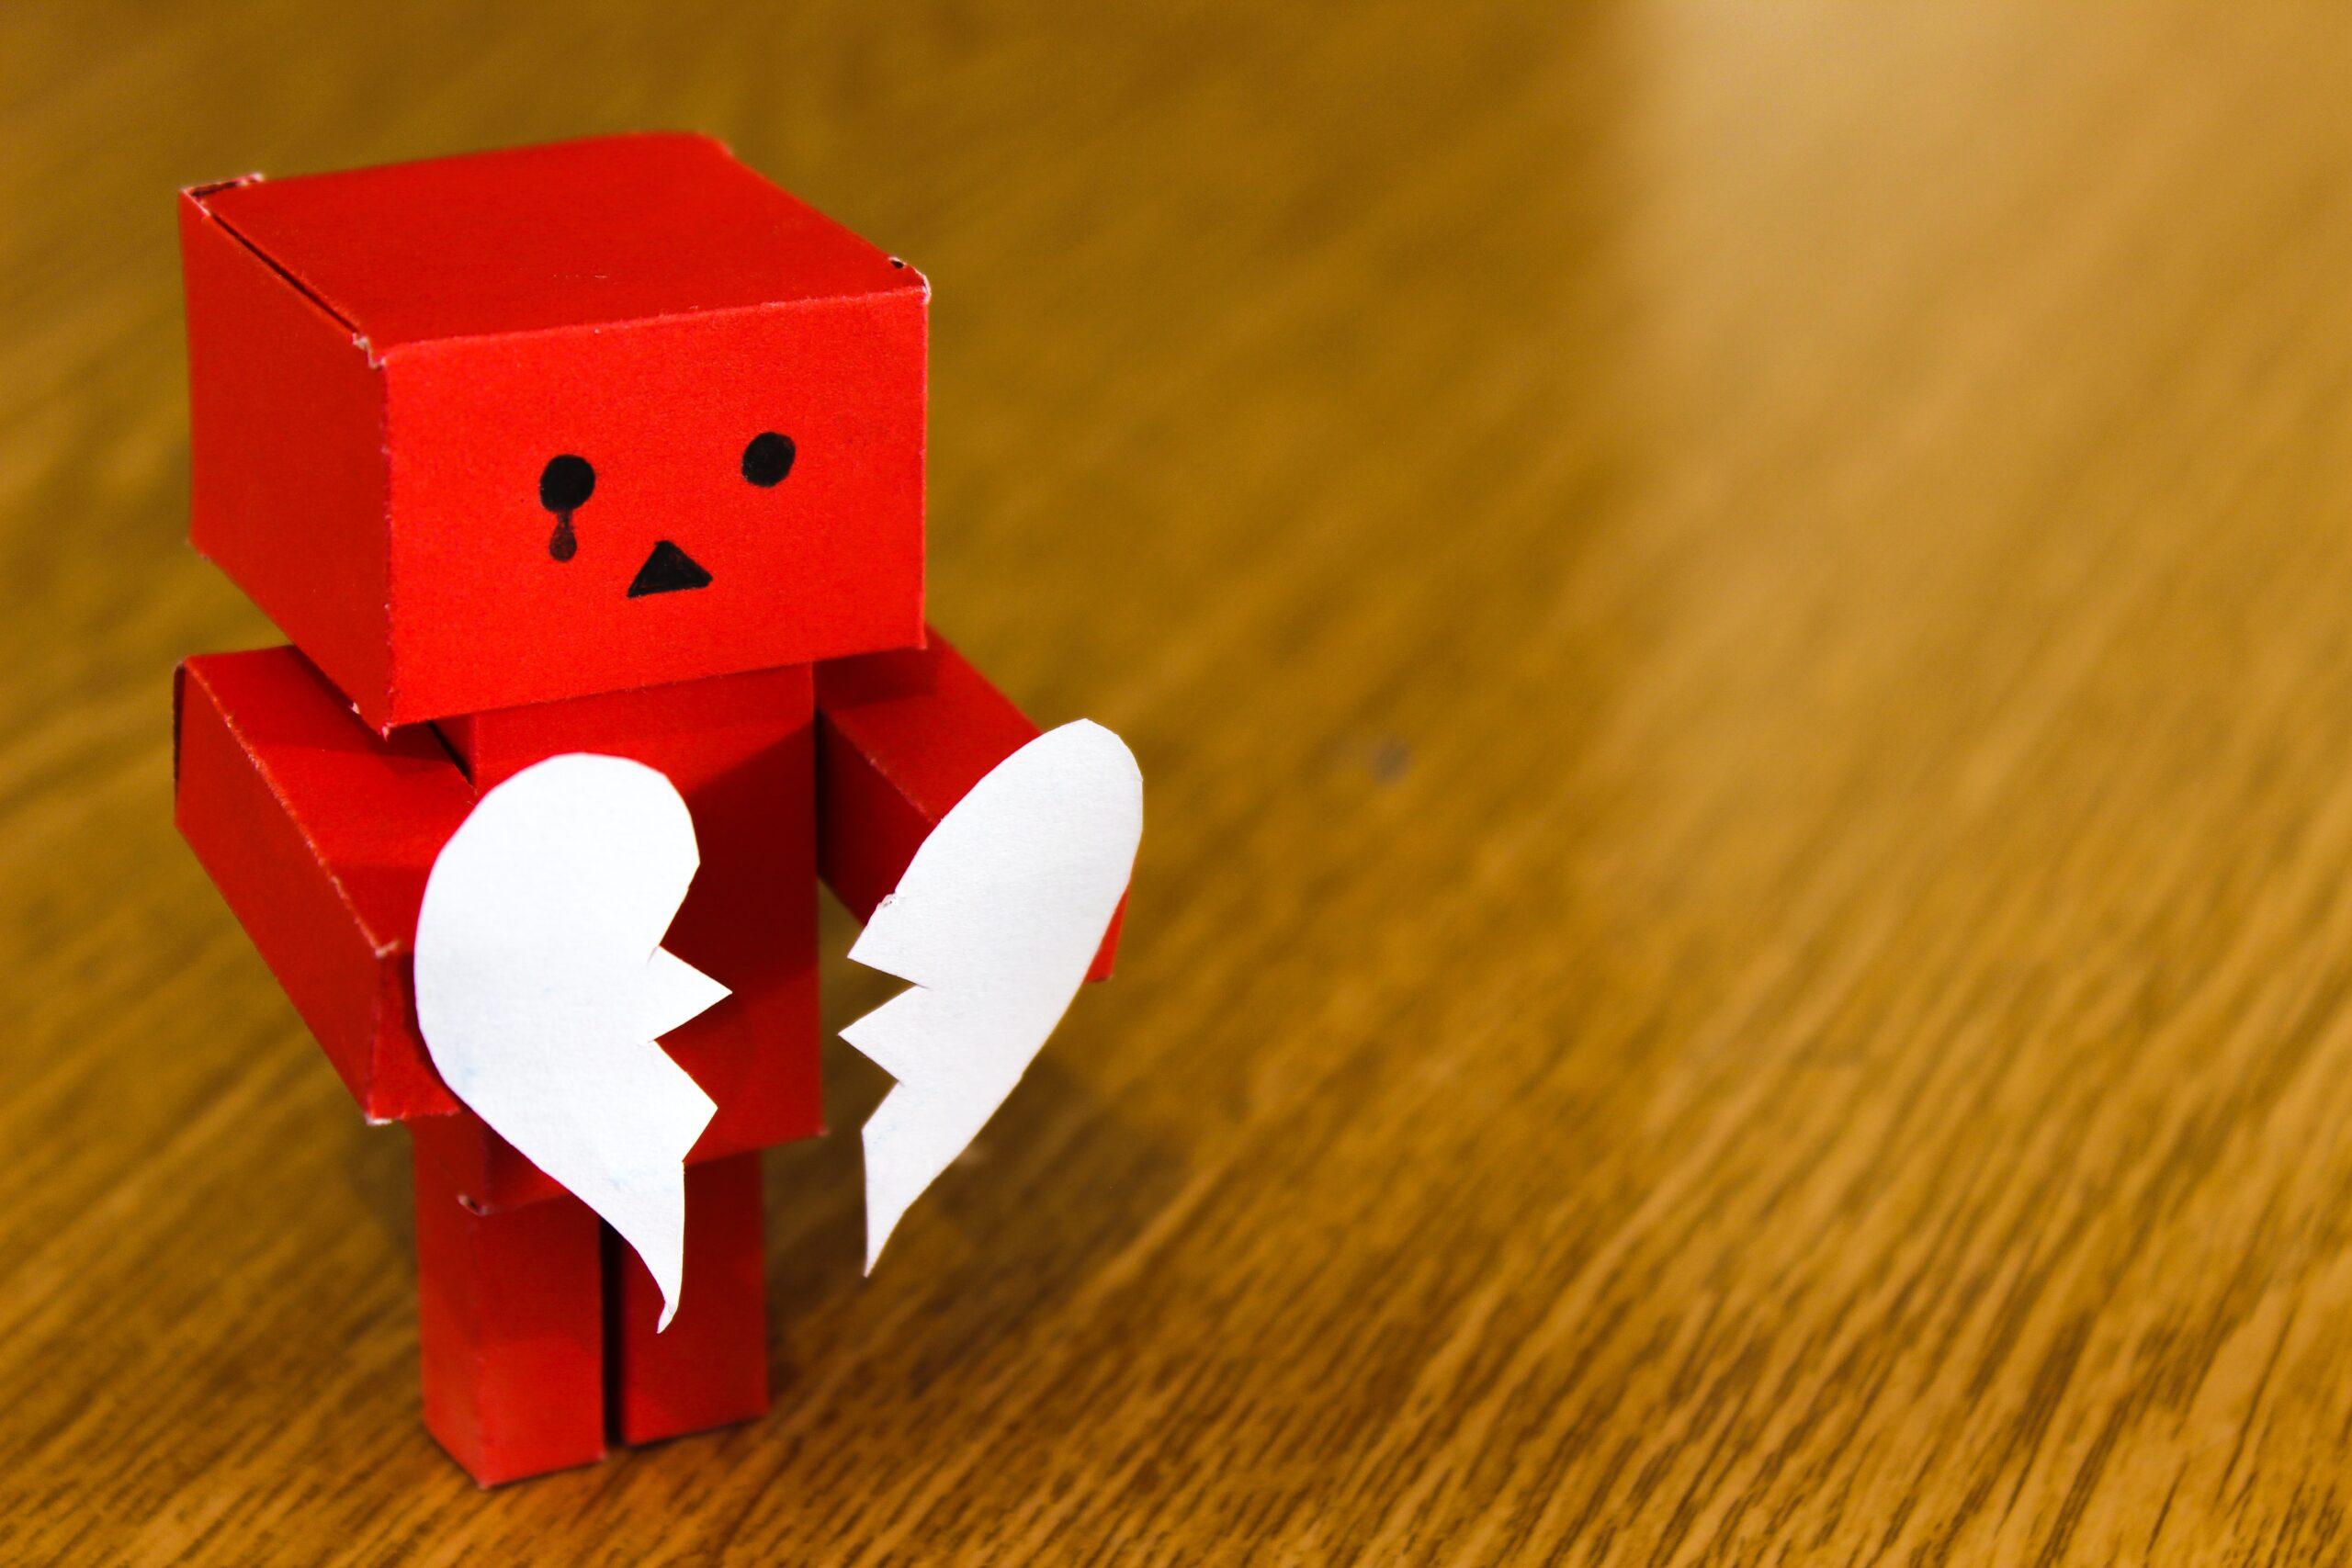 Situatii de divort intre notar avocat sau psiholog